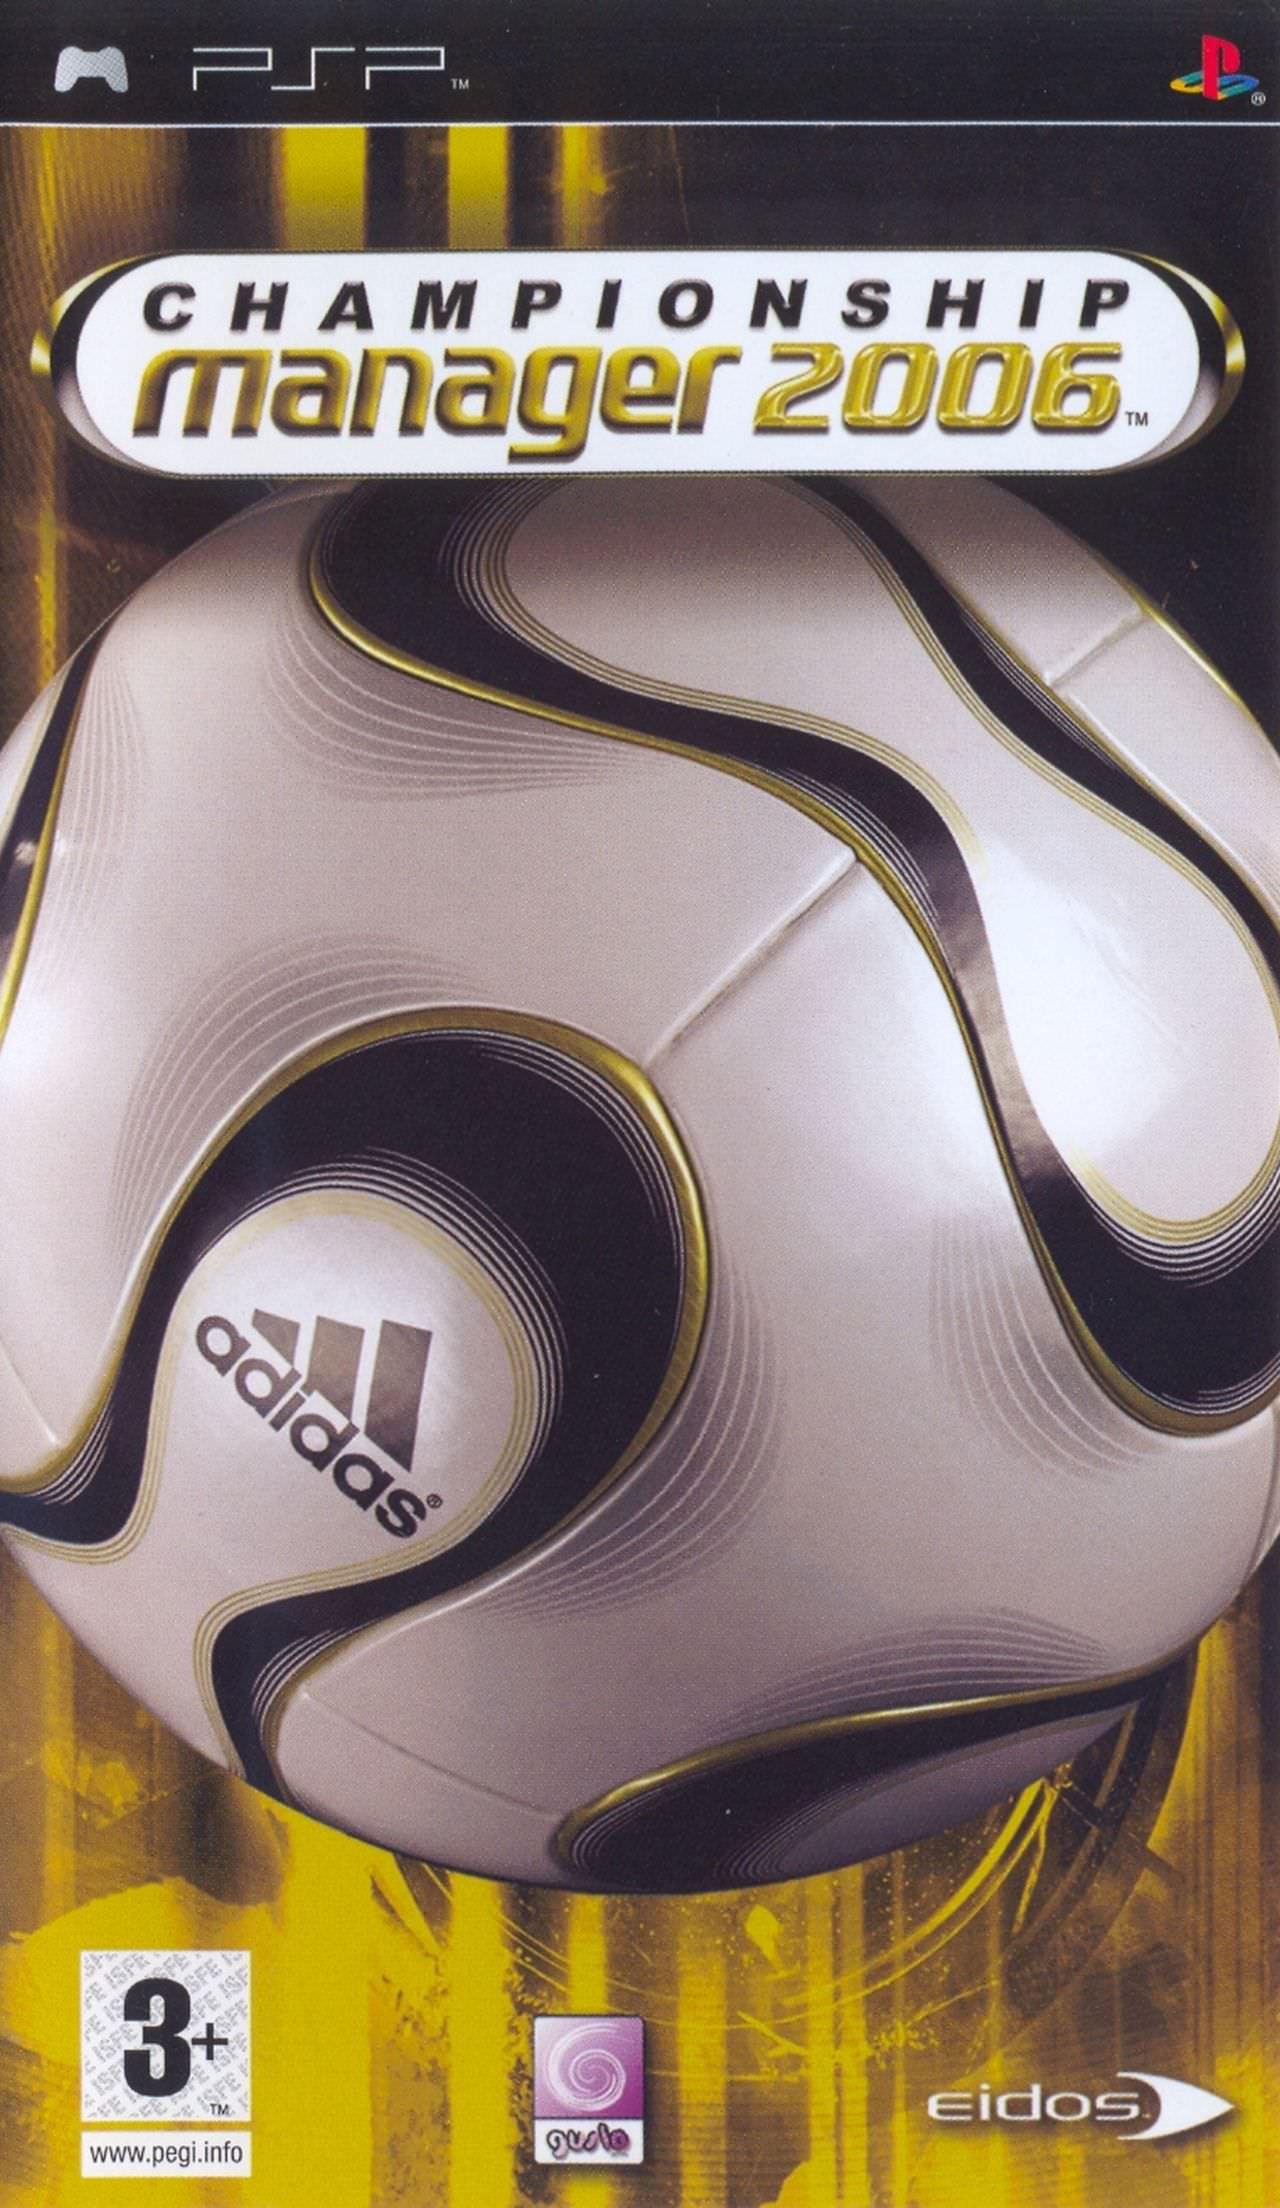 Championship Manager 2006